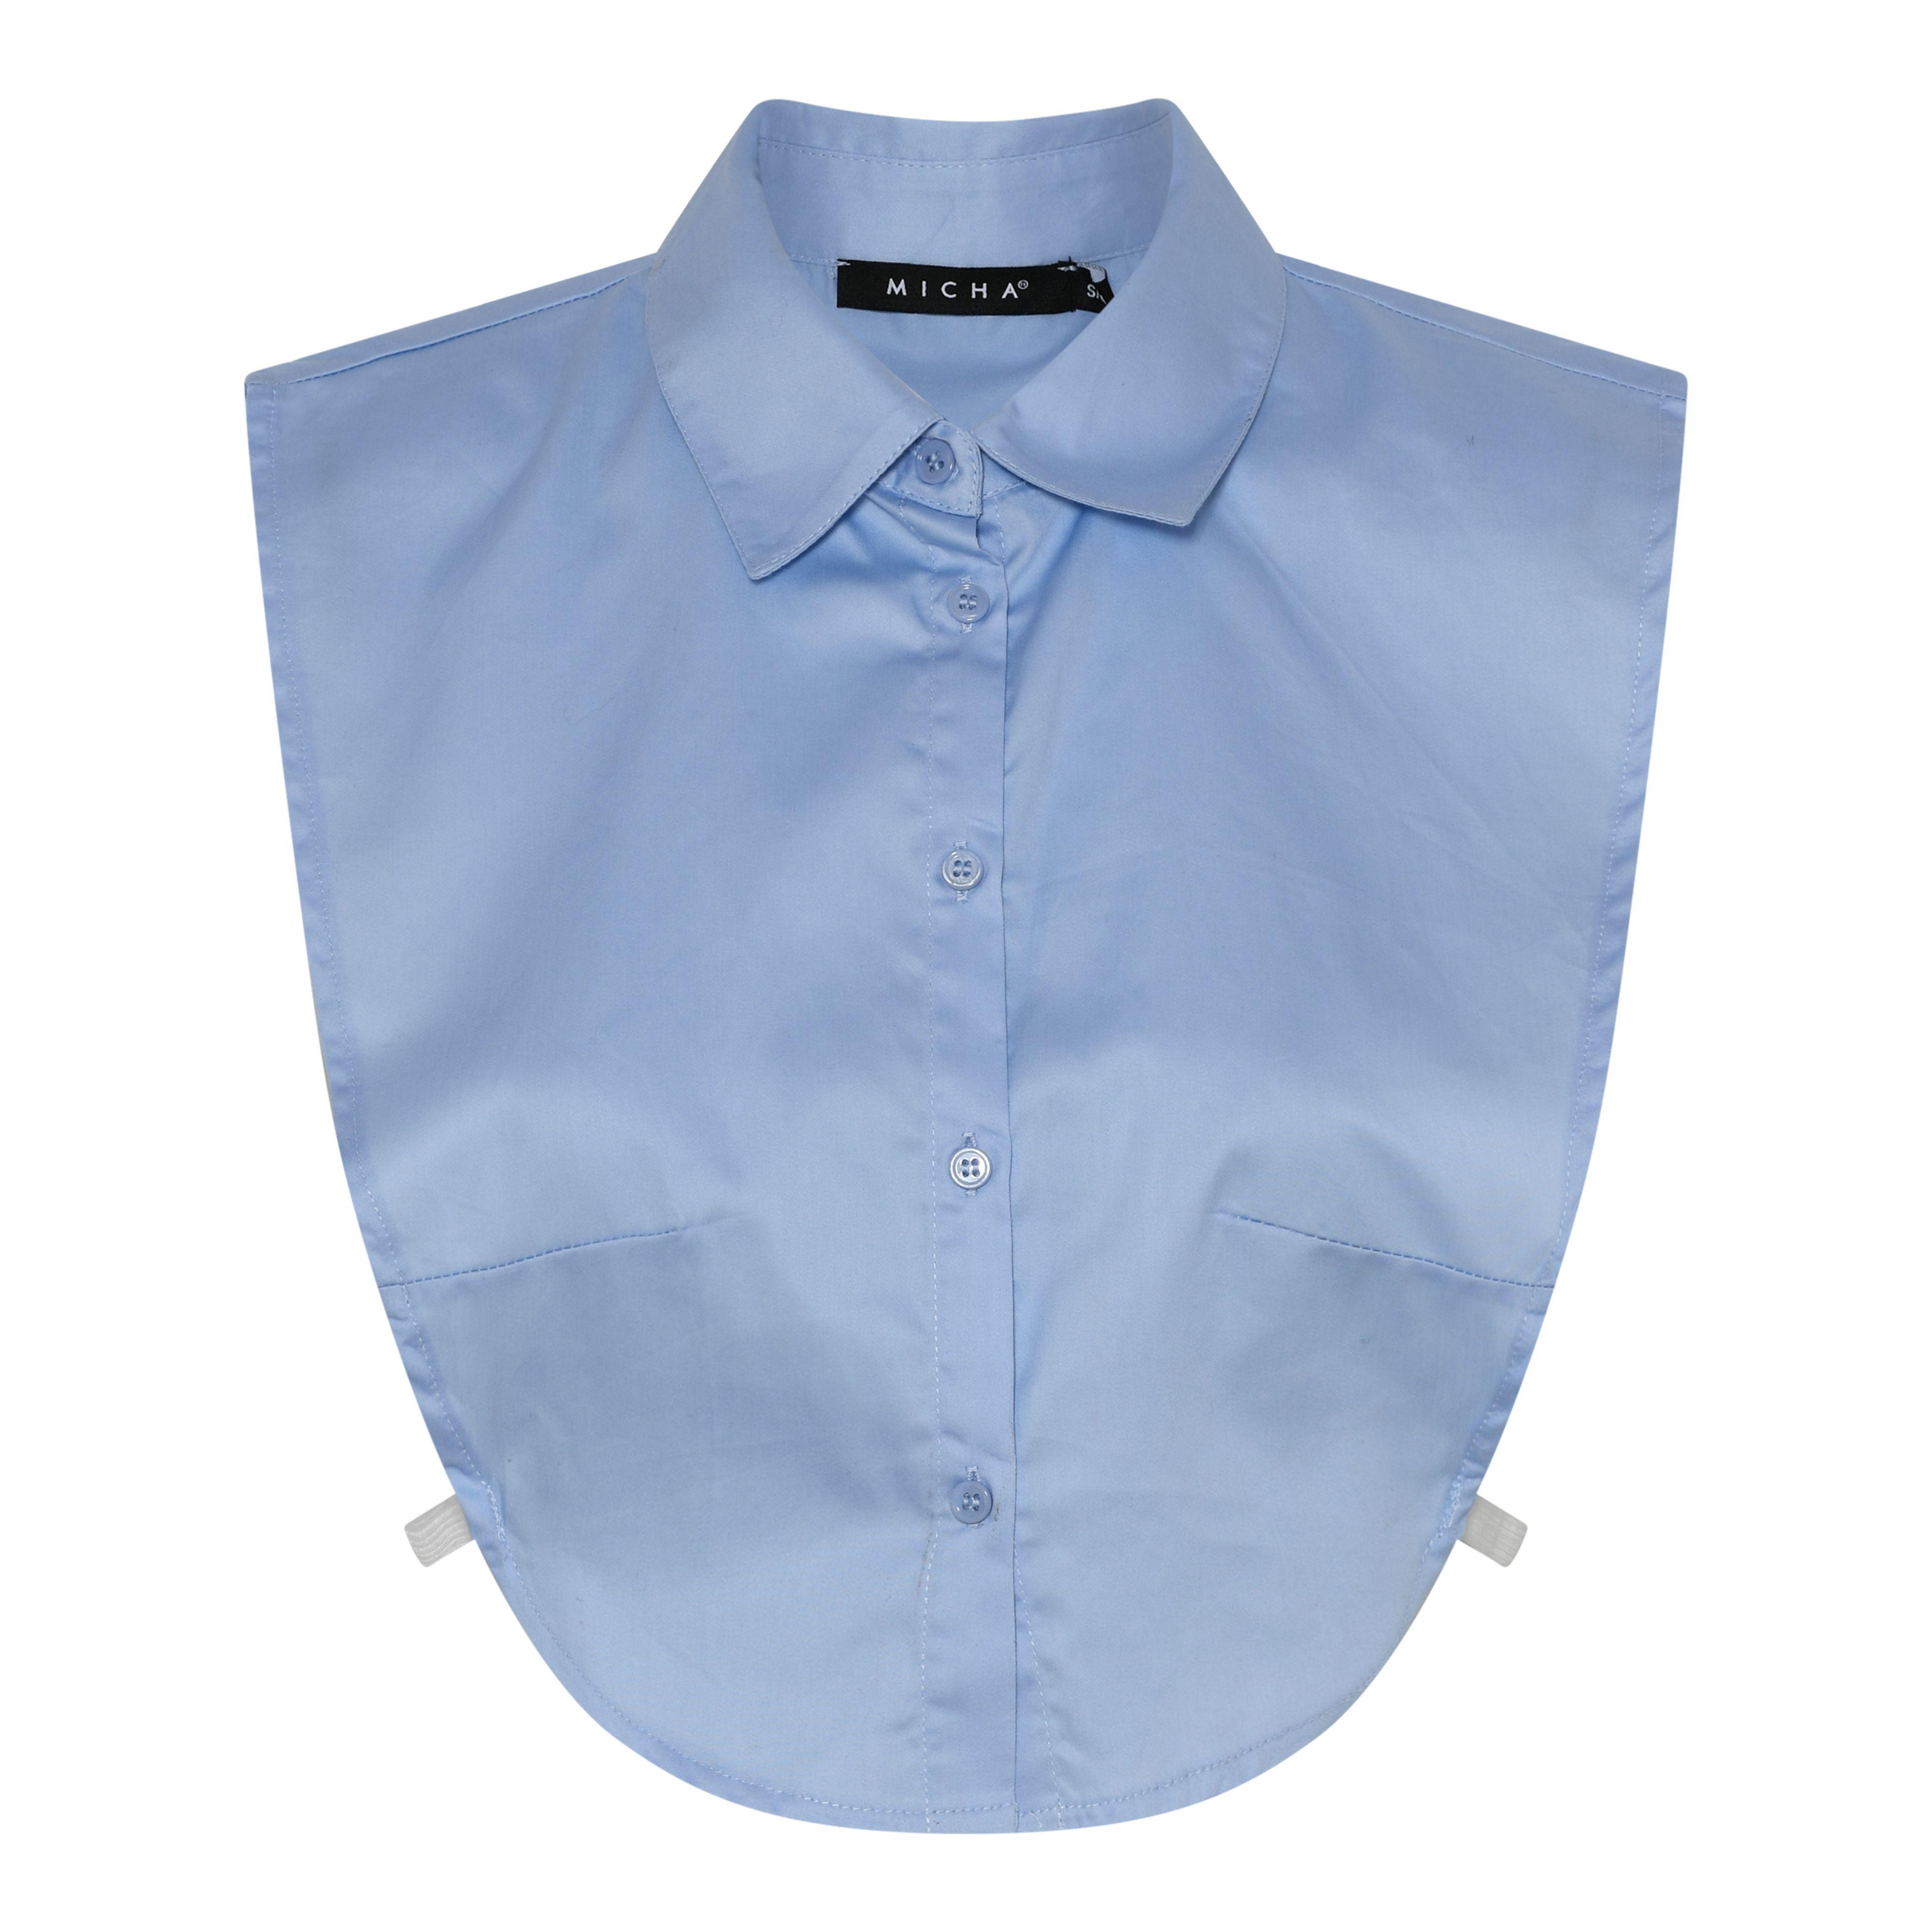 Micha skjortekrave